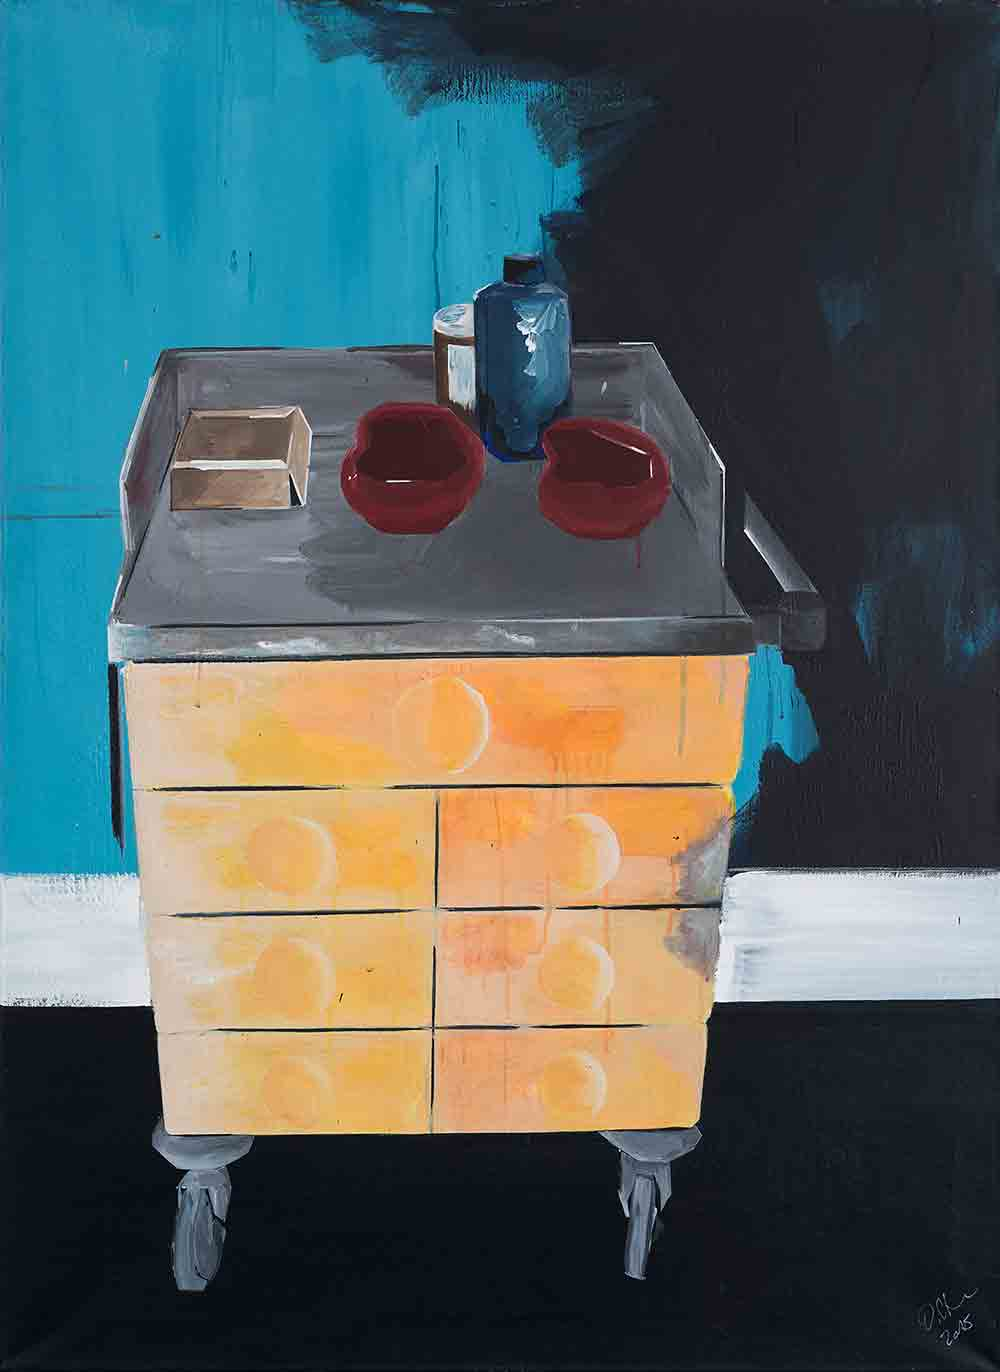 Painting_Endstadium_Dikla_Stern_Contemporary_Art